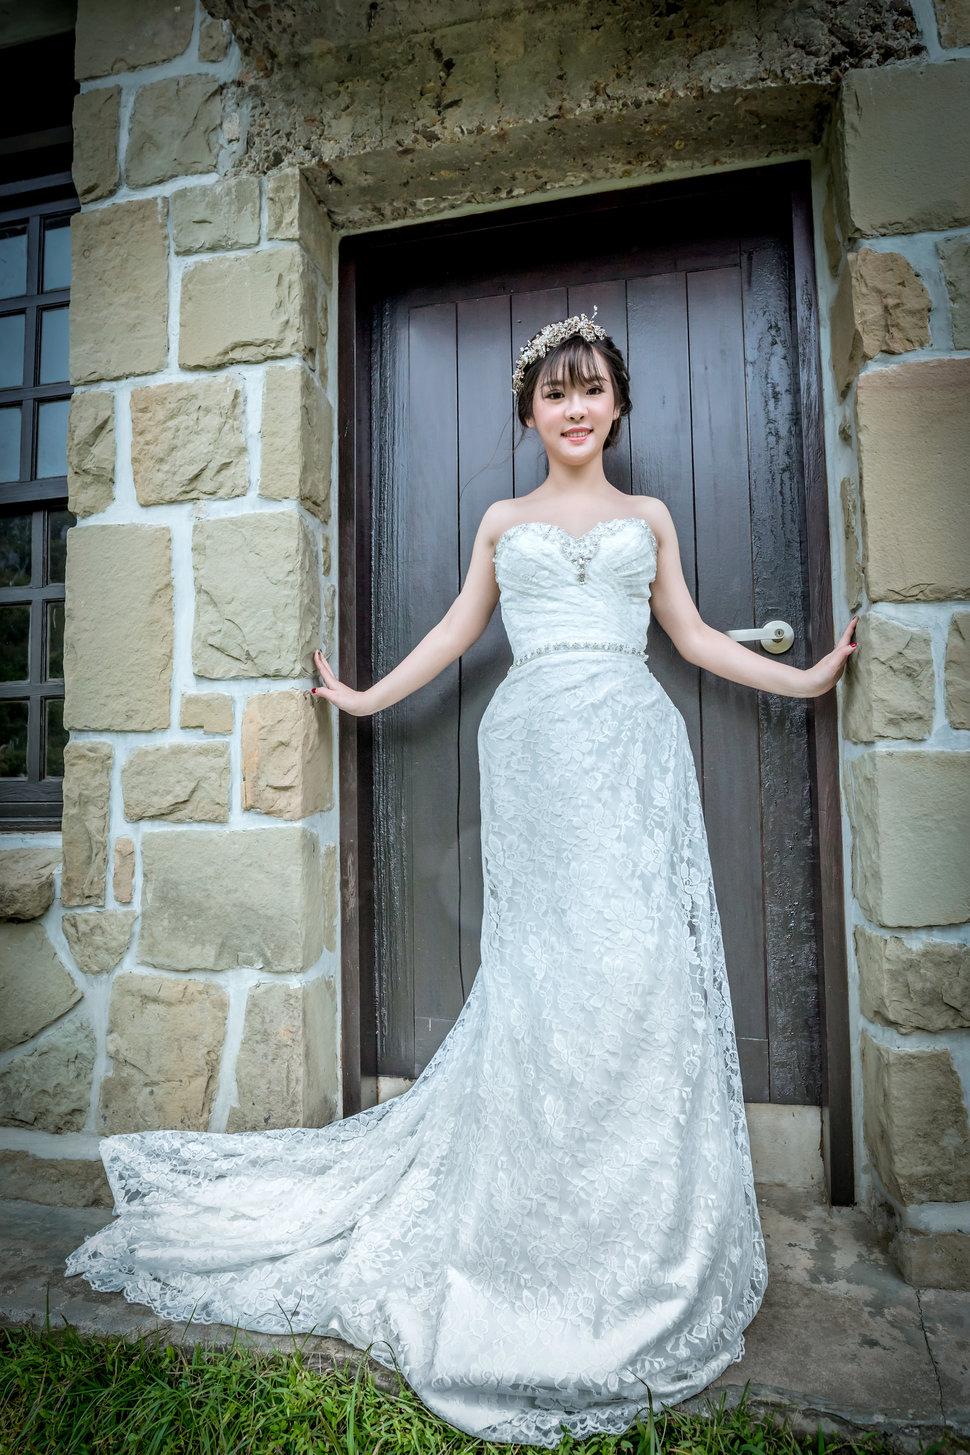 5D4_5739 - Promaker婚禮紀錄攝影團隊婚攝豪哥《結婚吧》